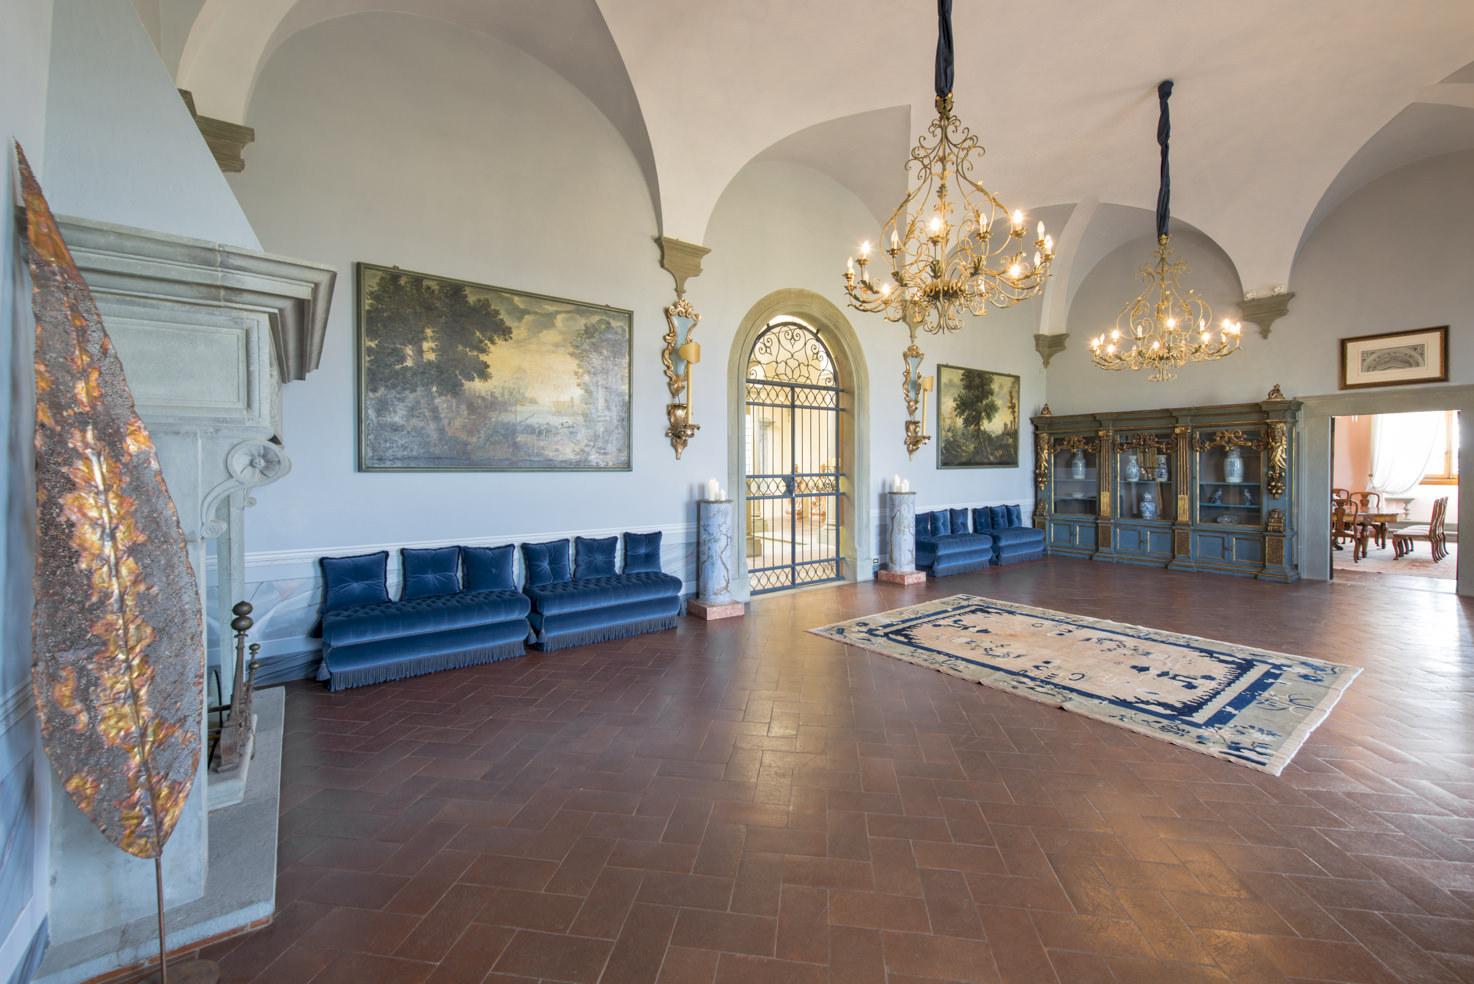 Frescoed hall at Villa Gamberaia